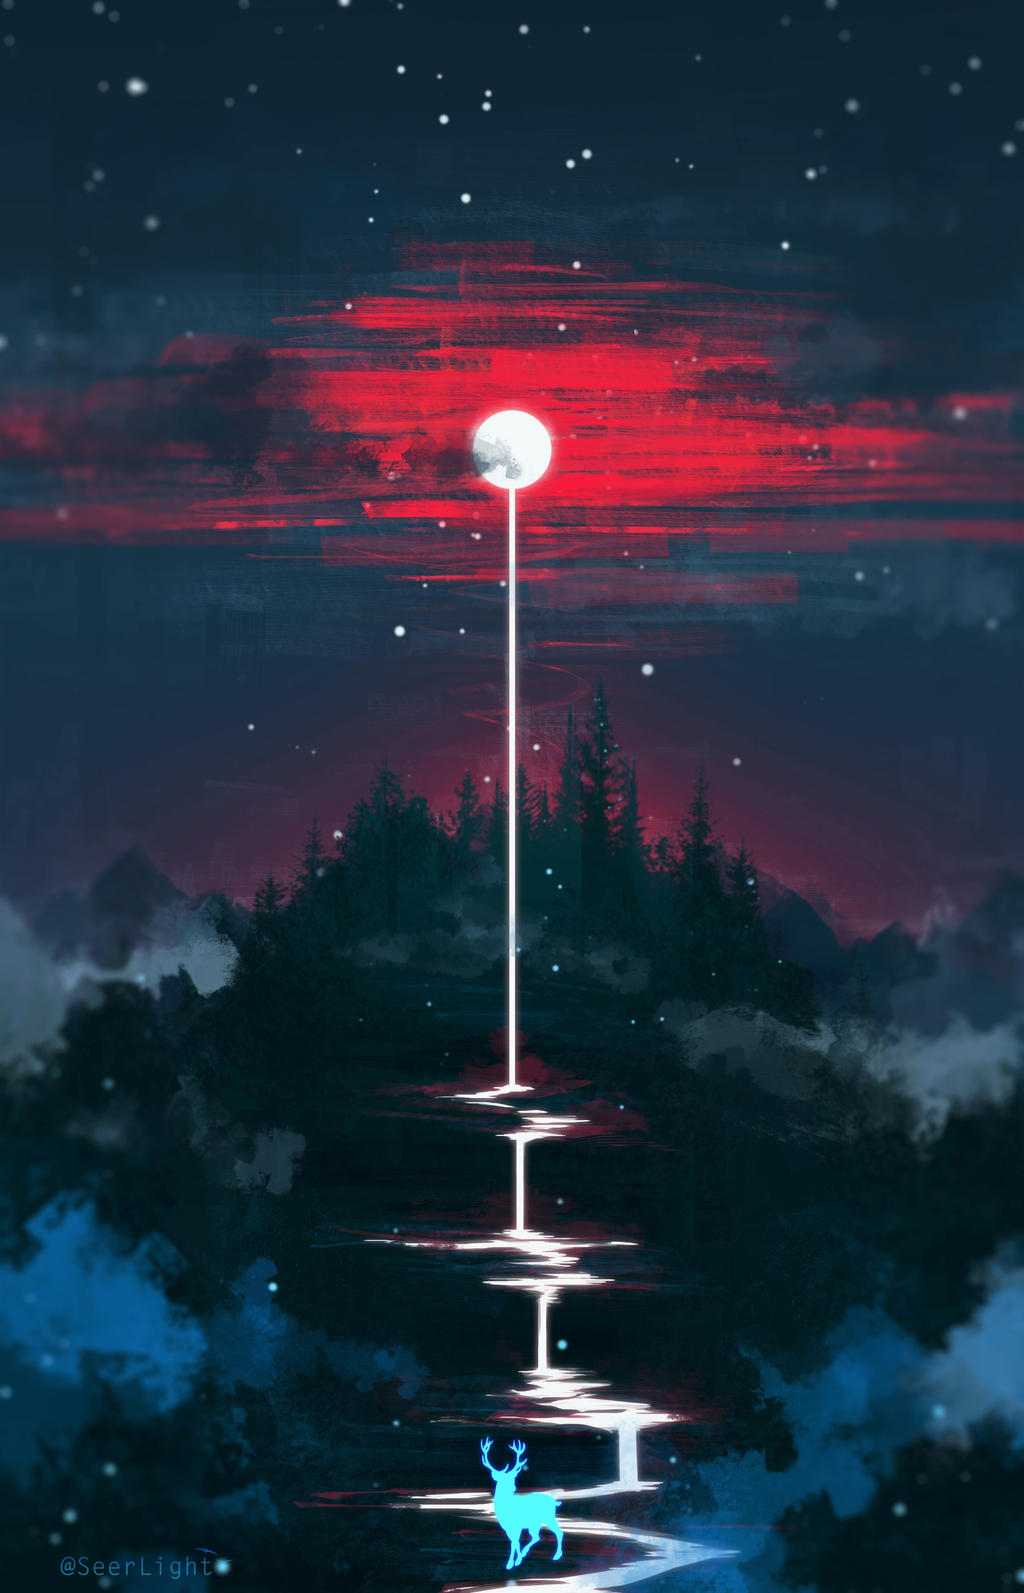 Lunar Dripping by SeerLight